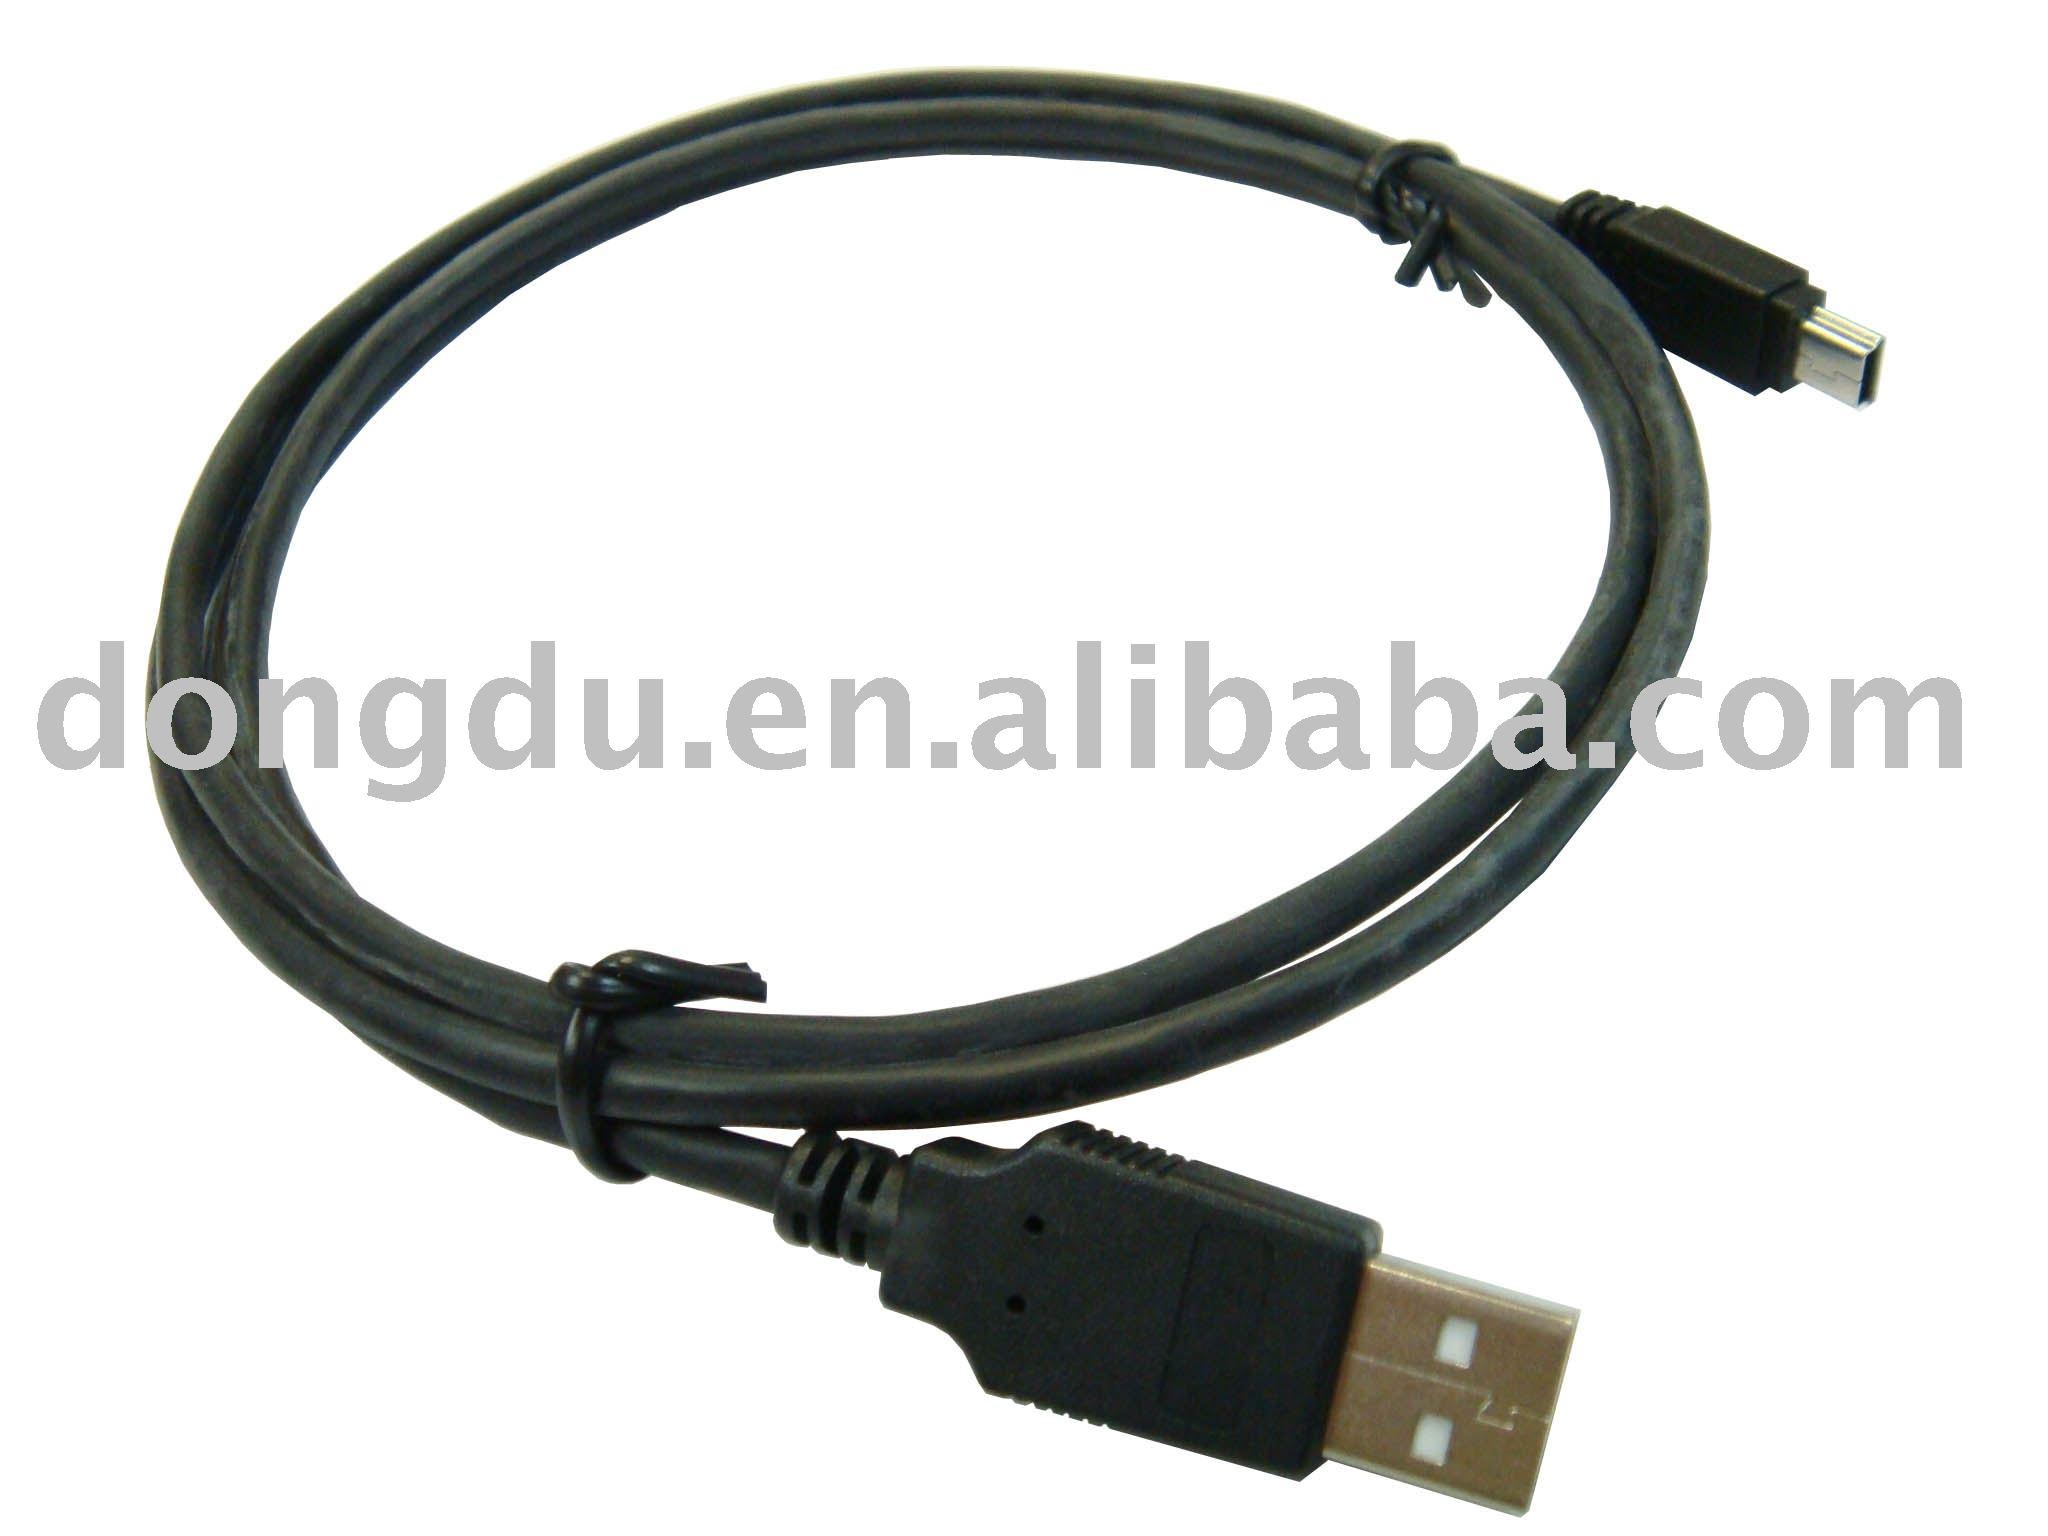 Usb 28awgx1p 24awgx2c High Speed Usb Cable